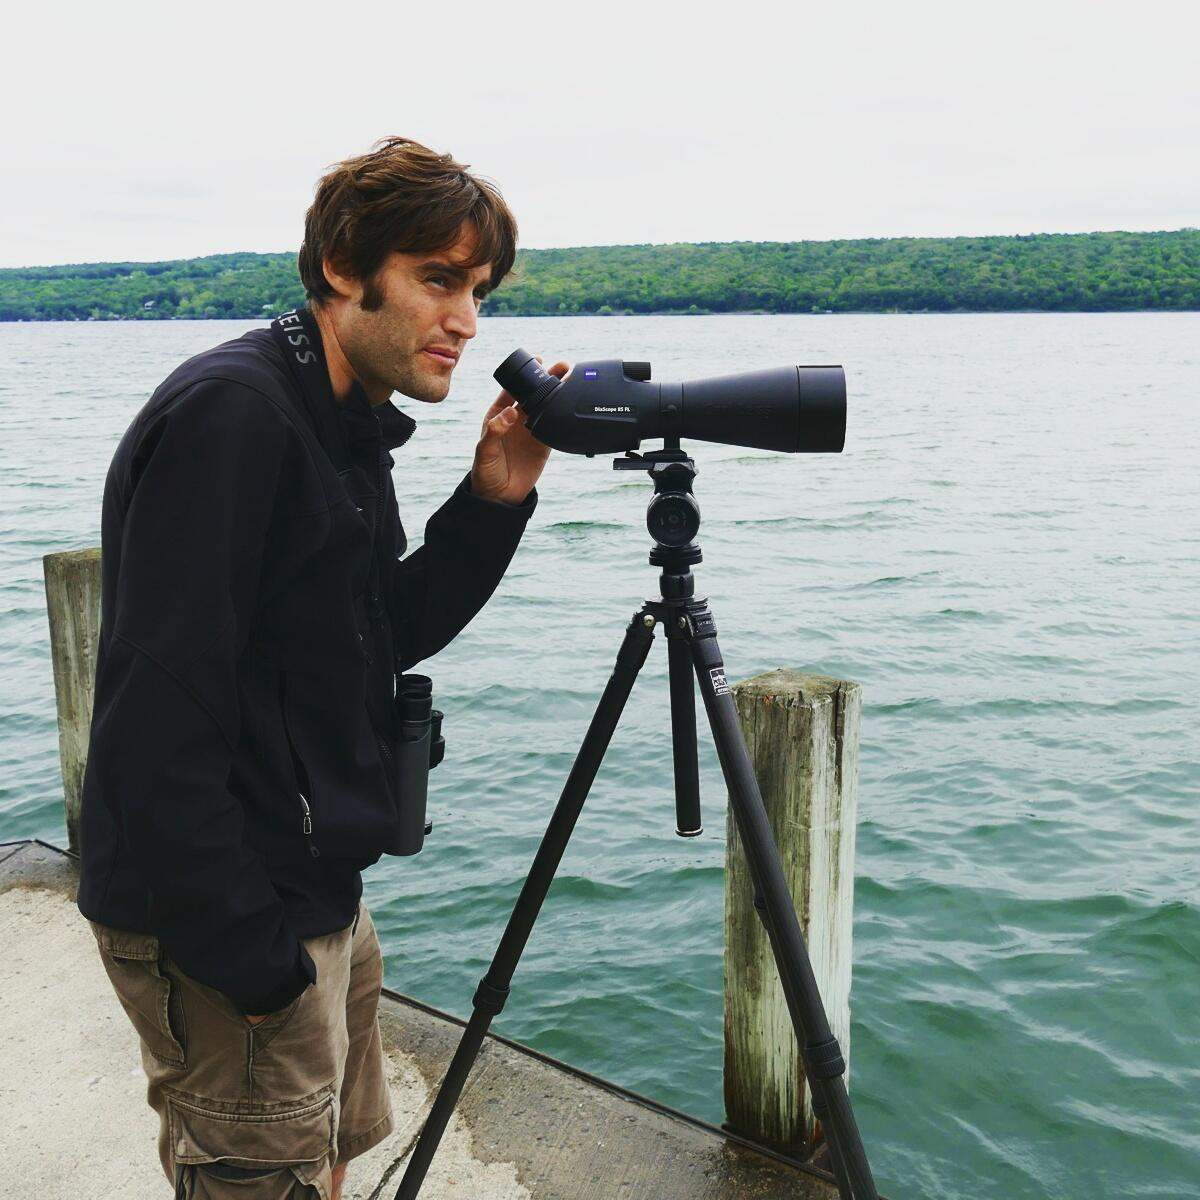 Tim Lenz searches for a Brown Pelican on Cayuga Lake near Ithaca. Noah Strycker